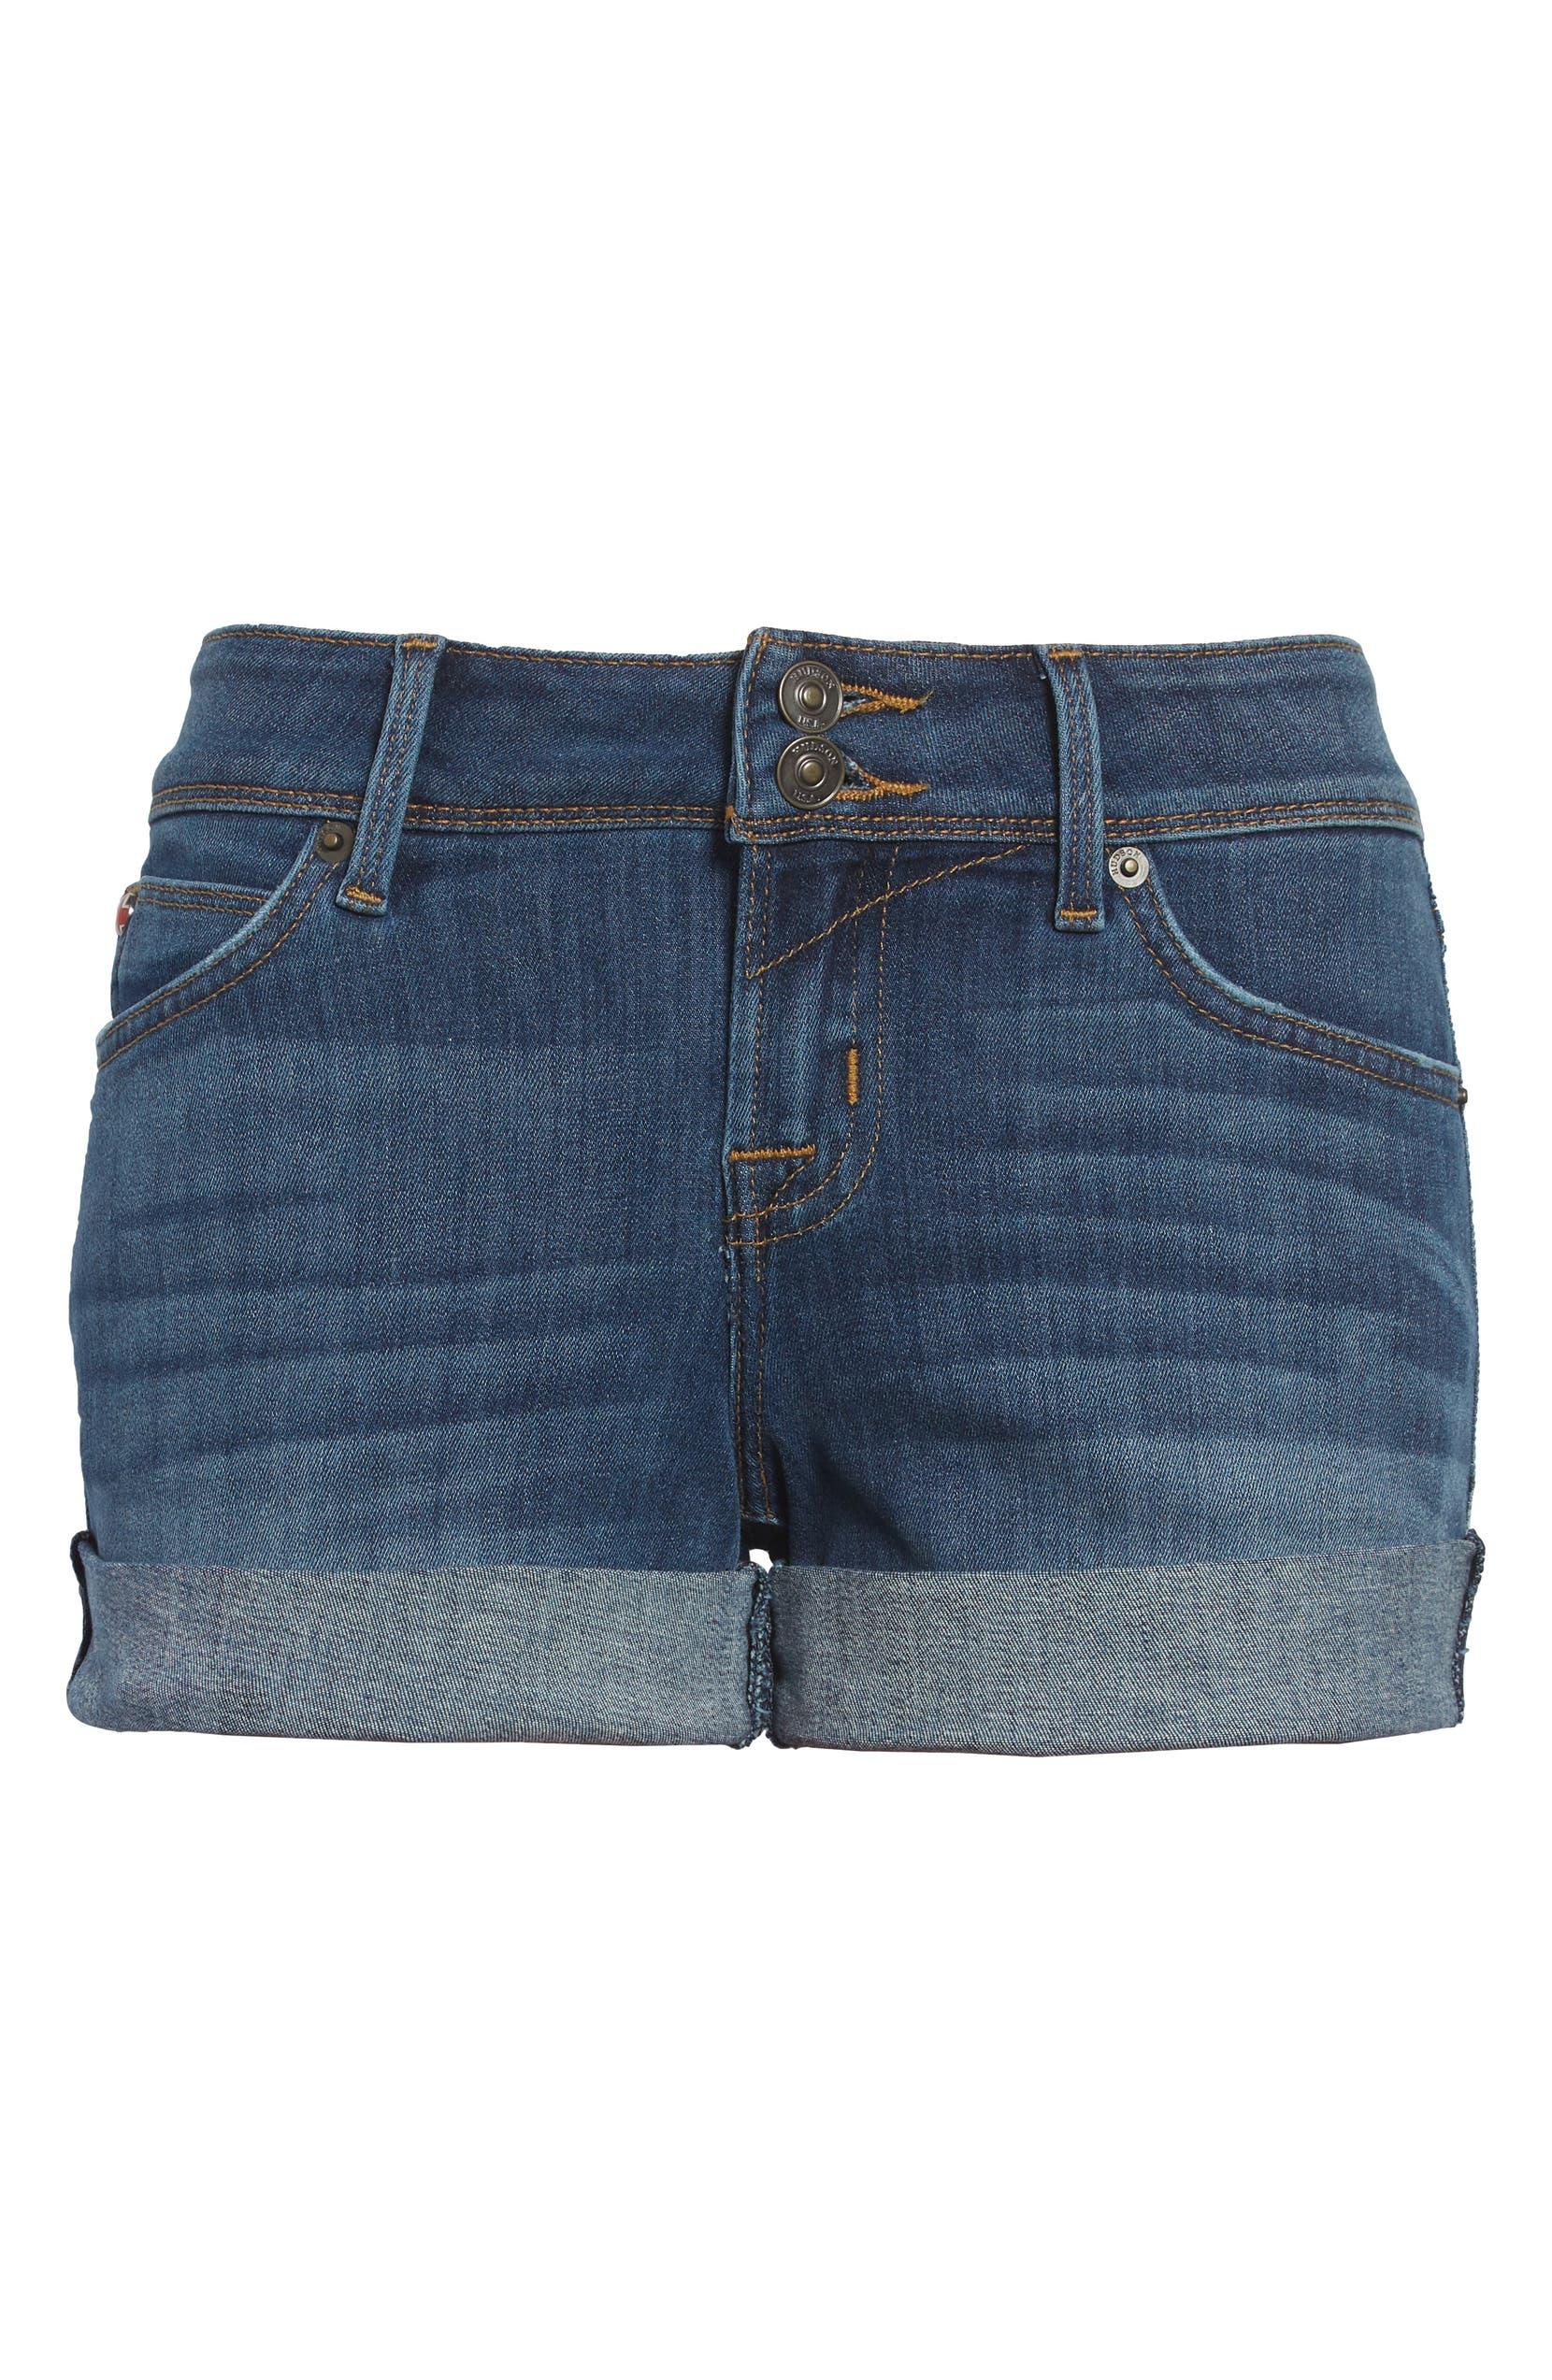 92e39cdad91 Hudson Jeans 'Croxley' Cuffed Denim Shorts (Elemental)   Nordstrom